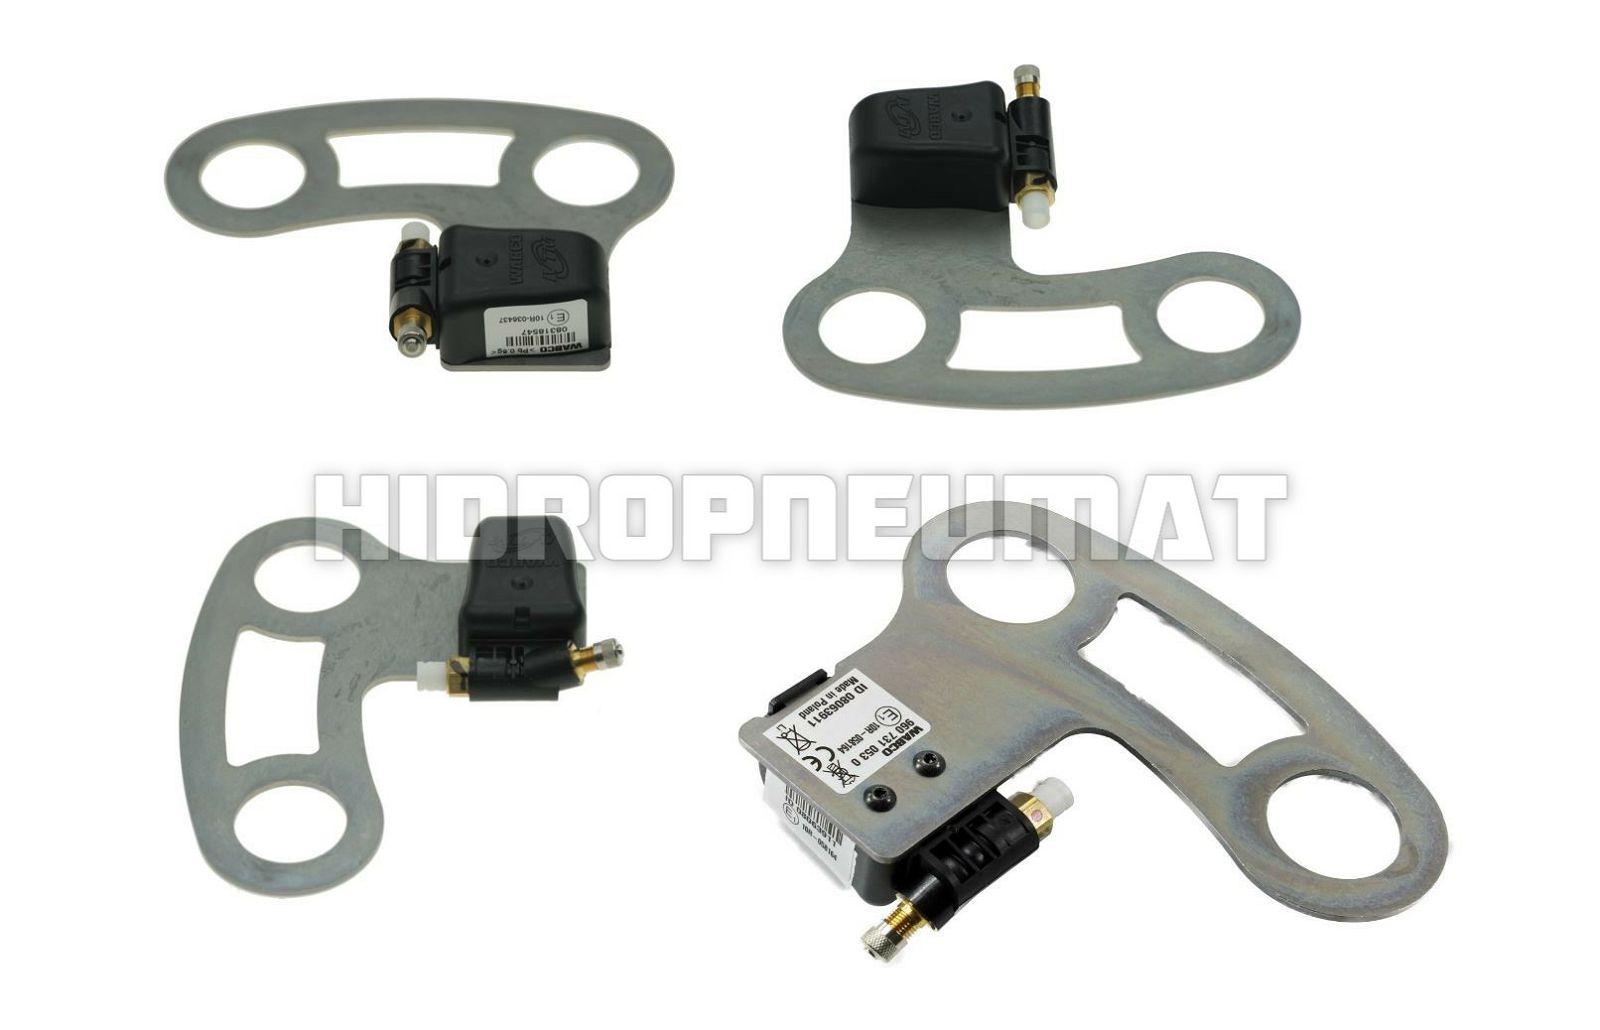 ivtm-senzor-modul-2-iveco-wabco-125644_1.jpg